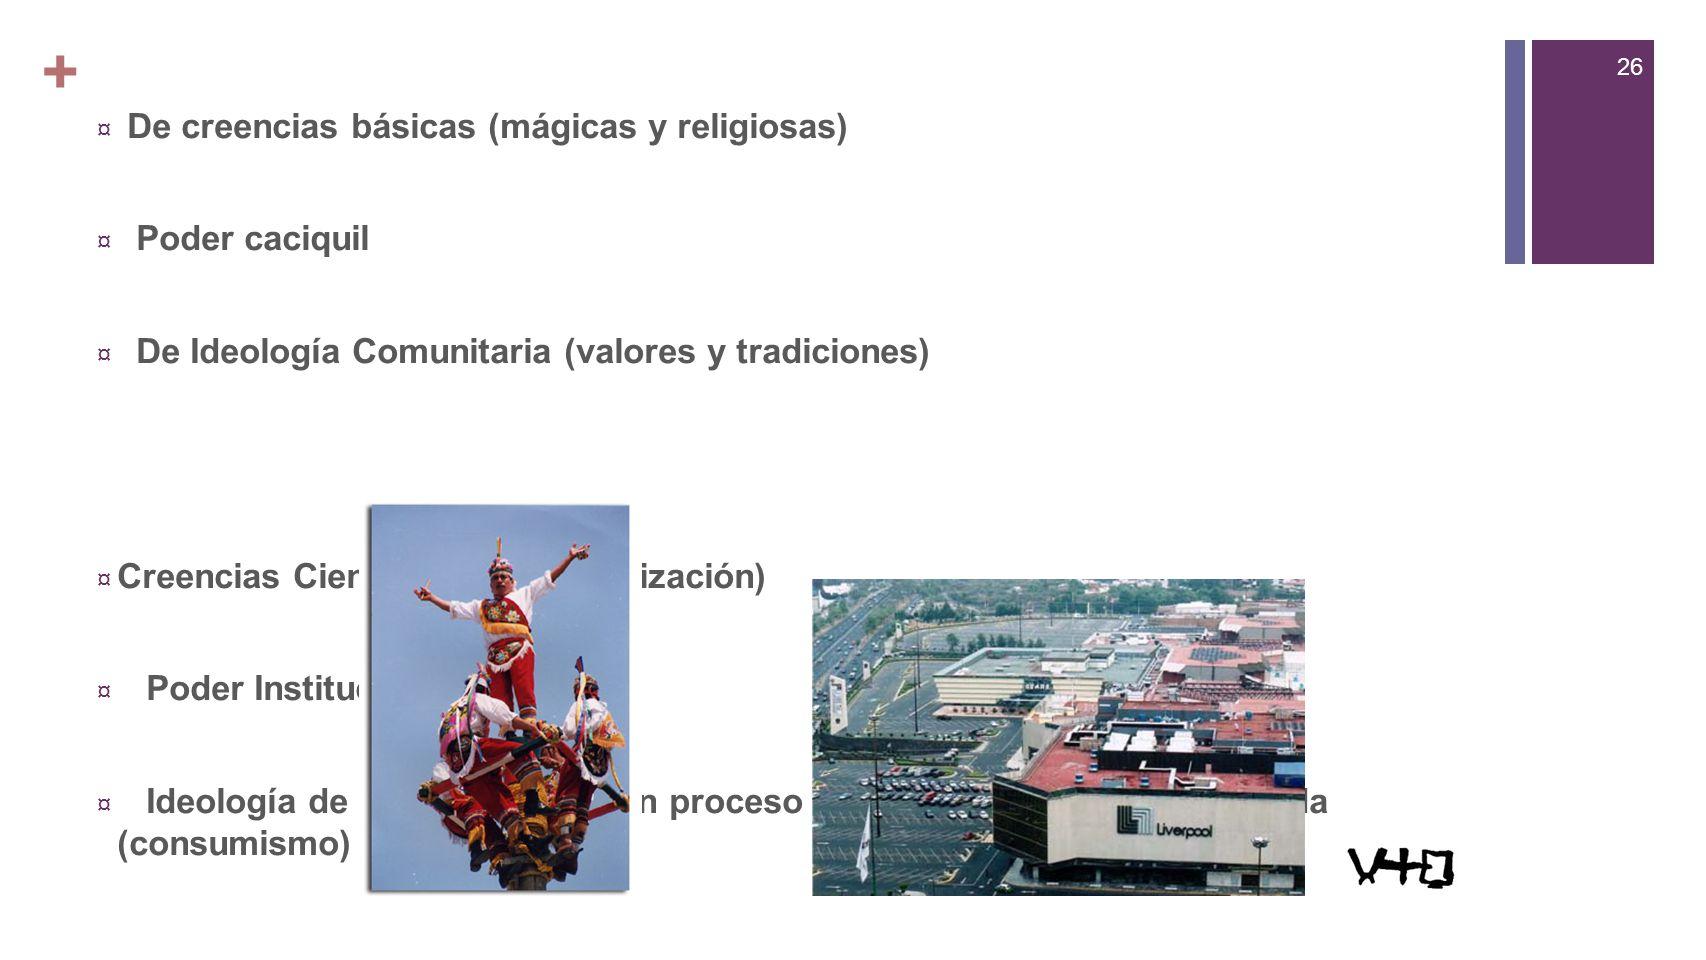 + De creencias básicas (mágicas y religiosas) Poder caciquil